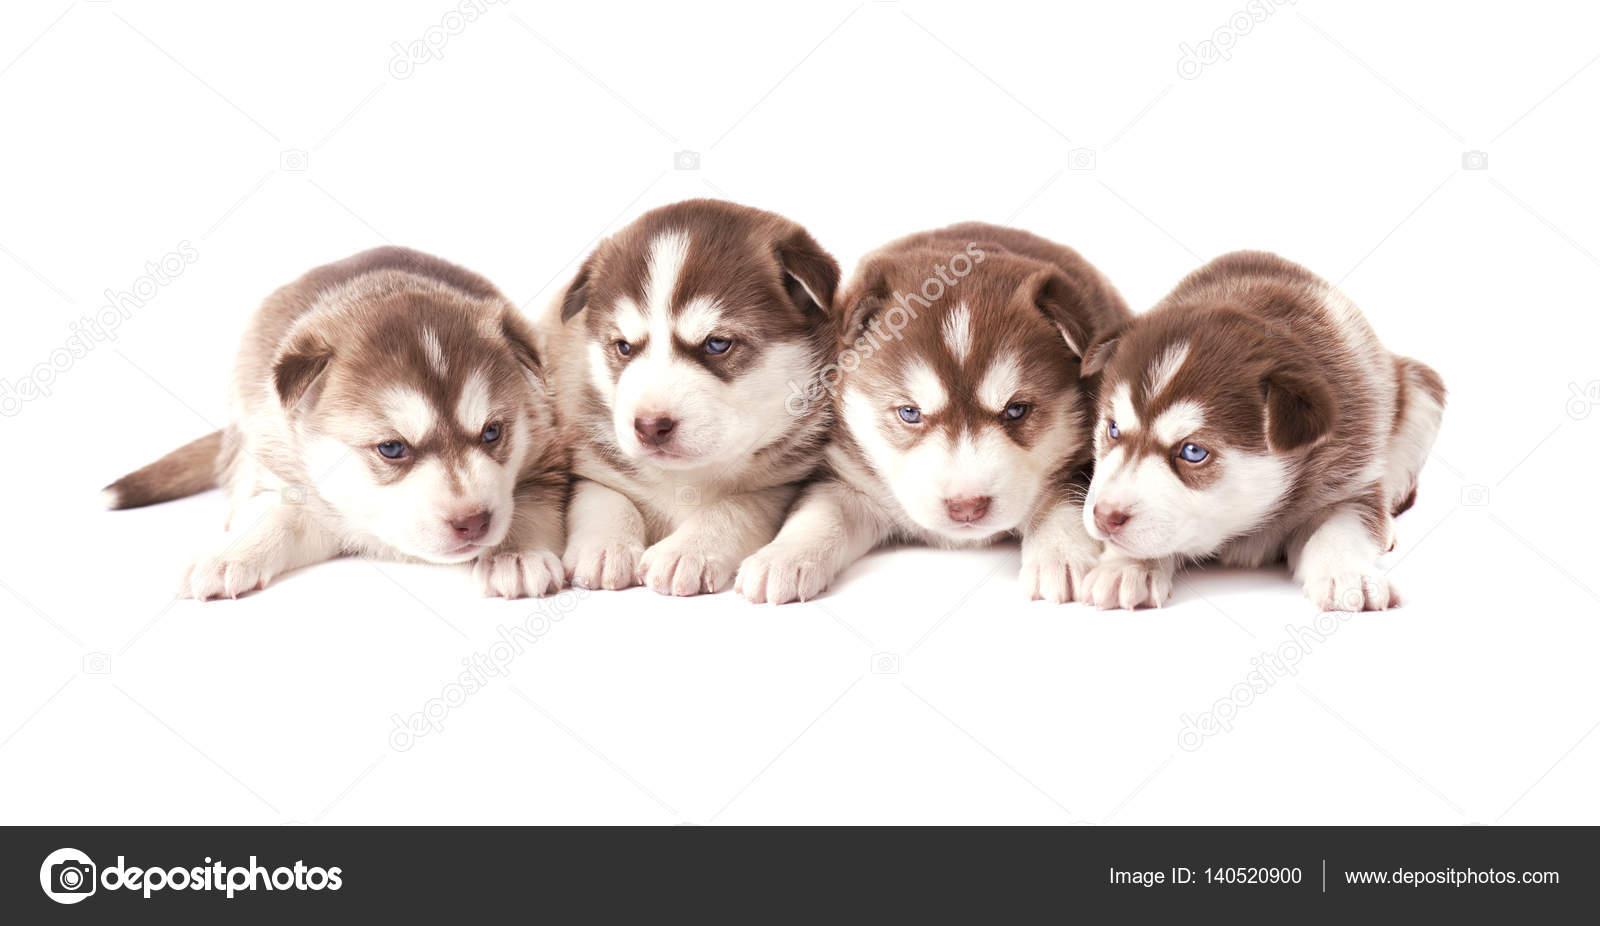 Group Of Siberian Husky Puppies Brown Puppies Husky Isolated Stock Photo C Vandycandy 140520900